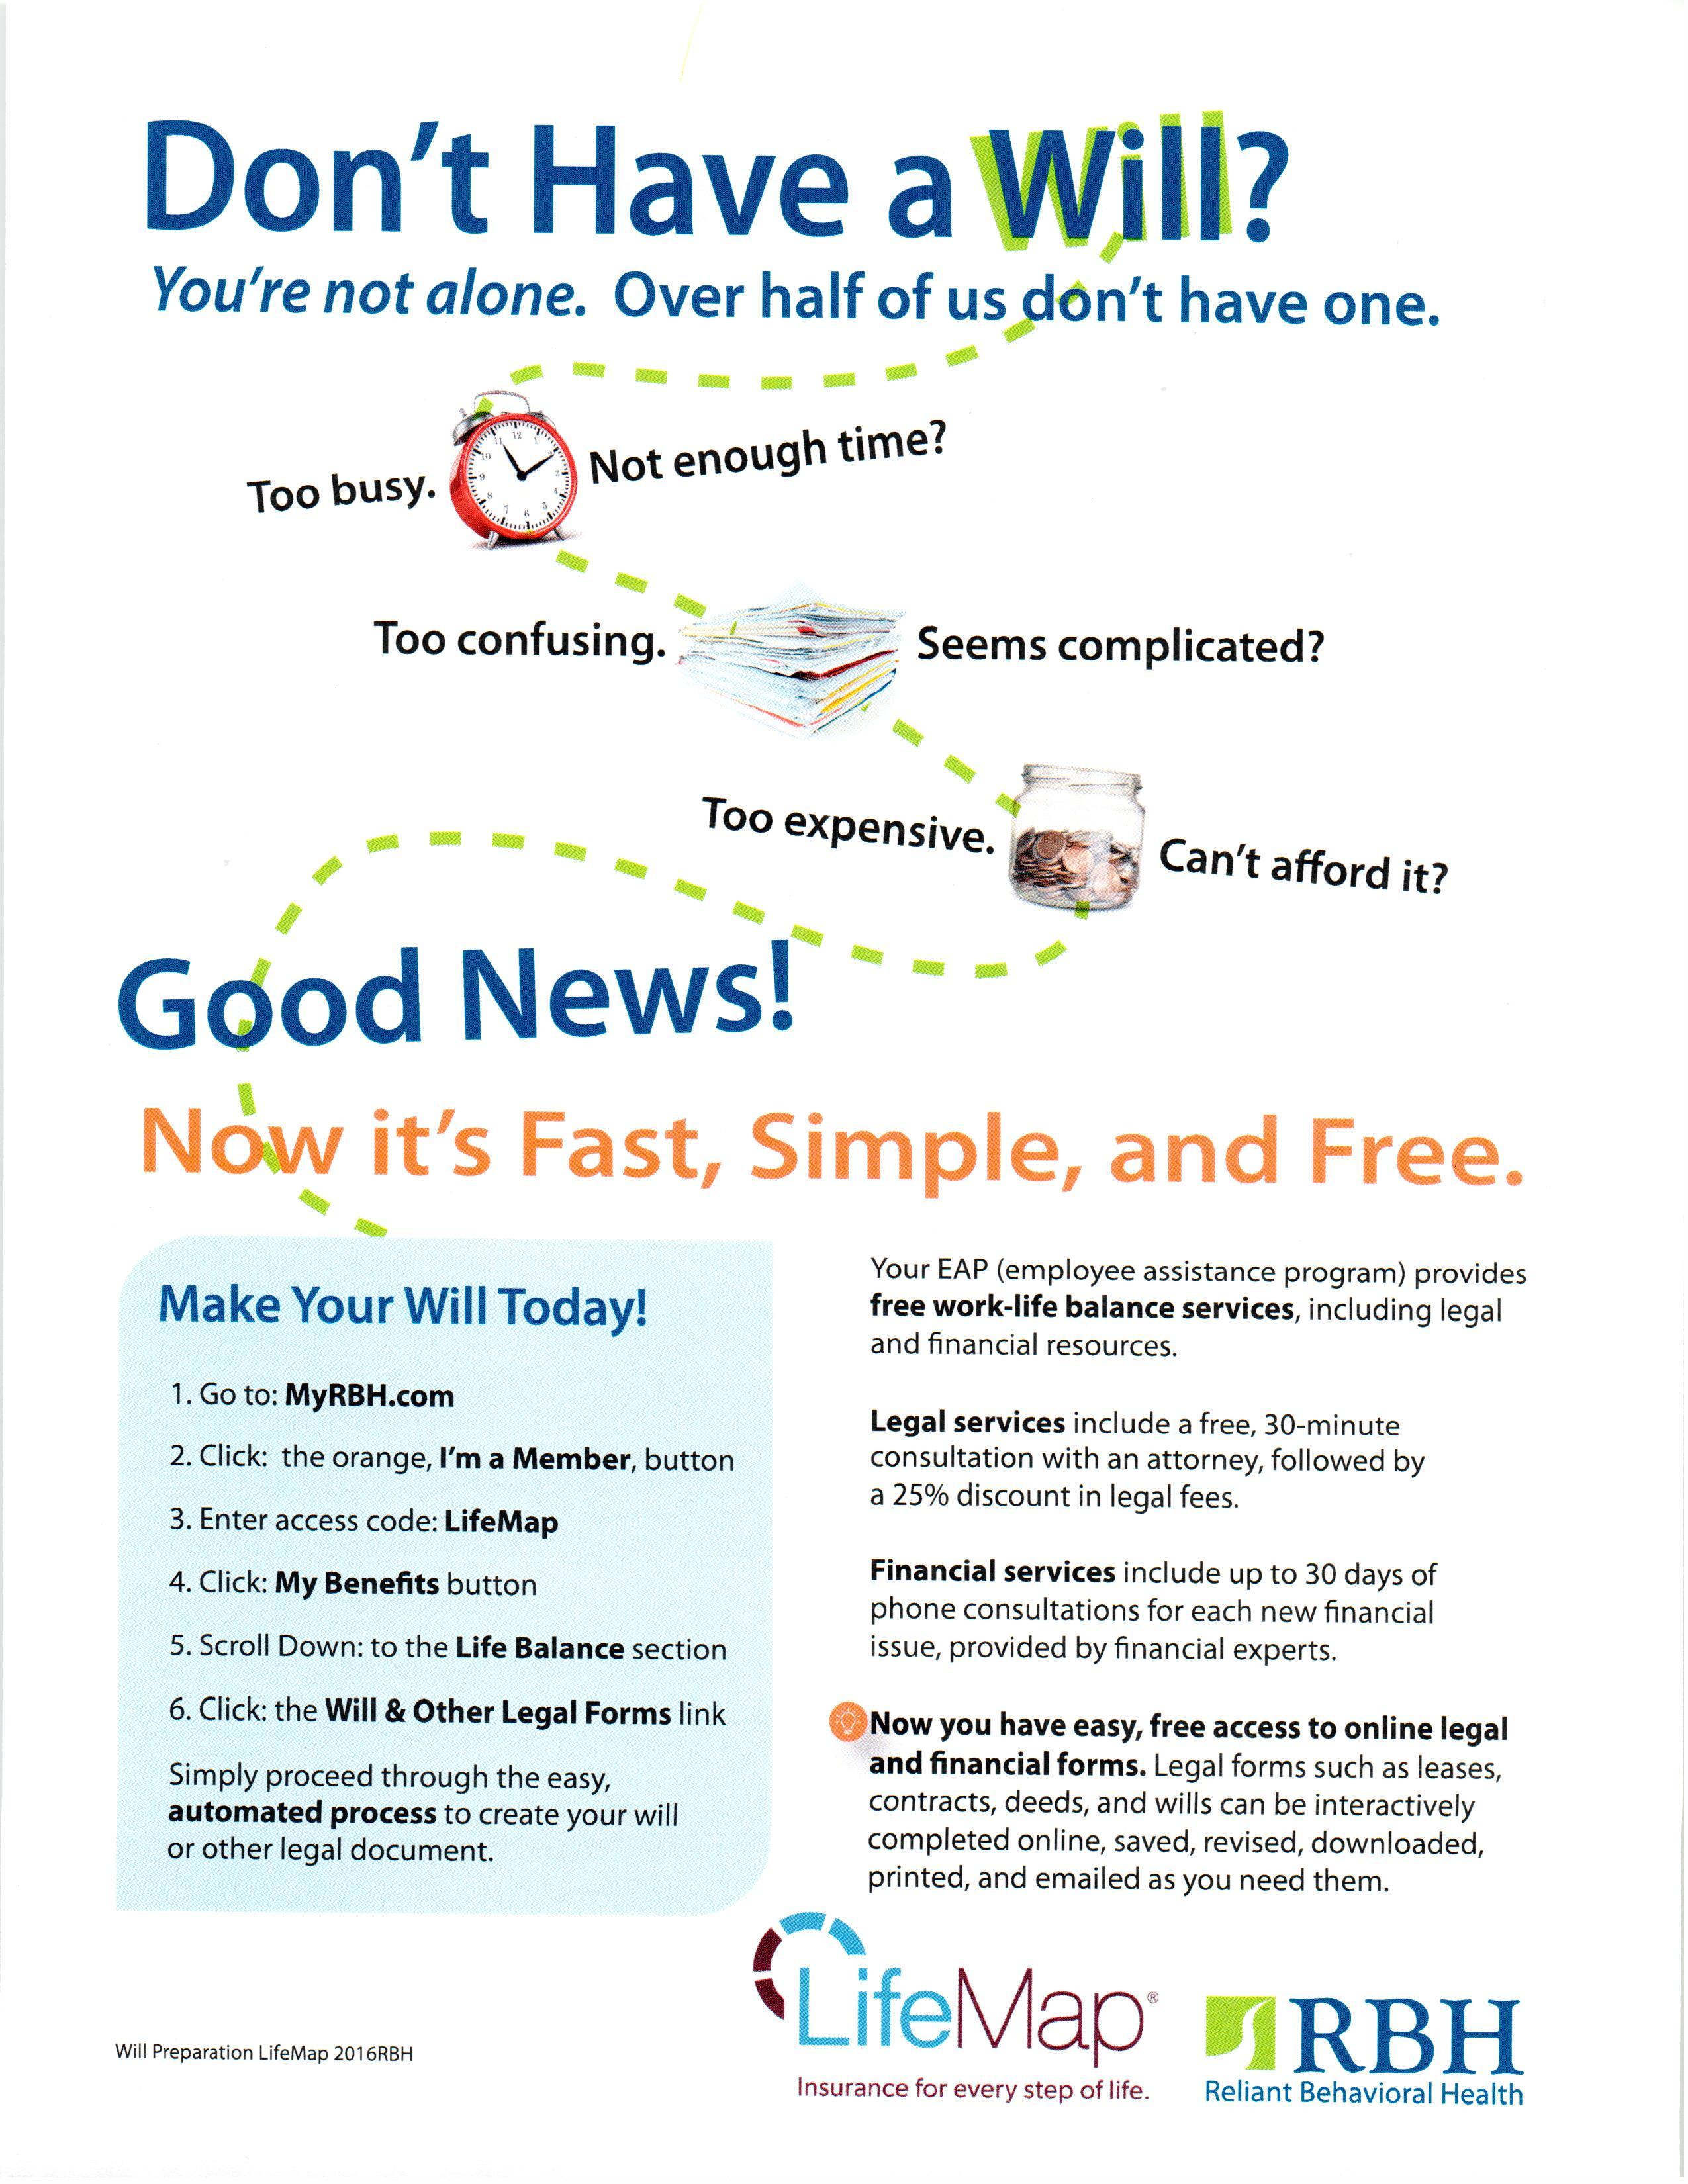 LifeMap Services